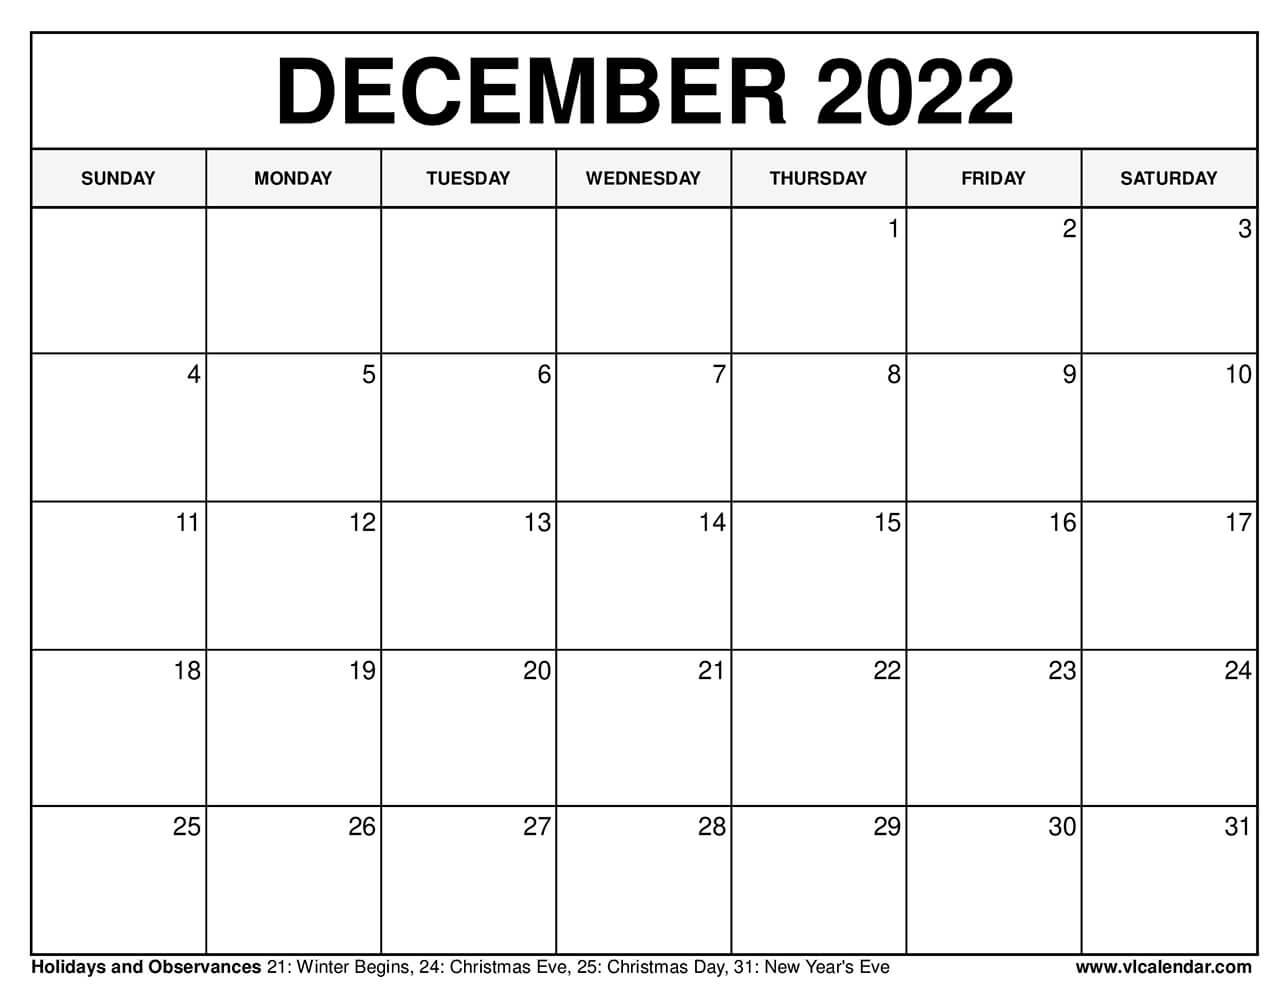 Calendar For December 2022.Printable December 2021 Calendar Templates With Holidays